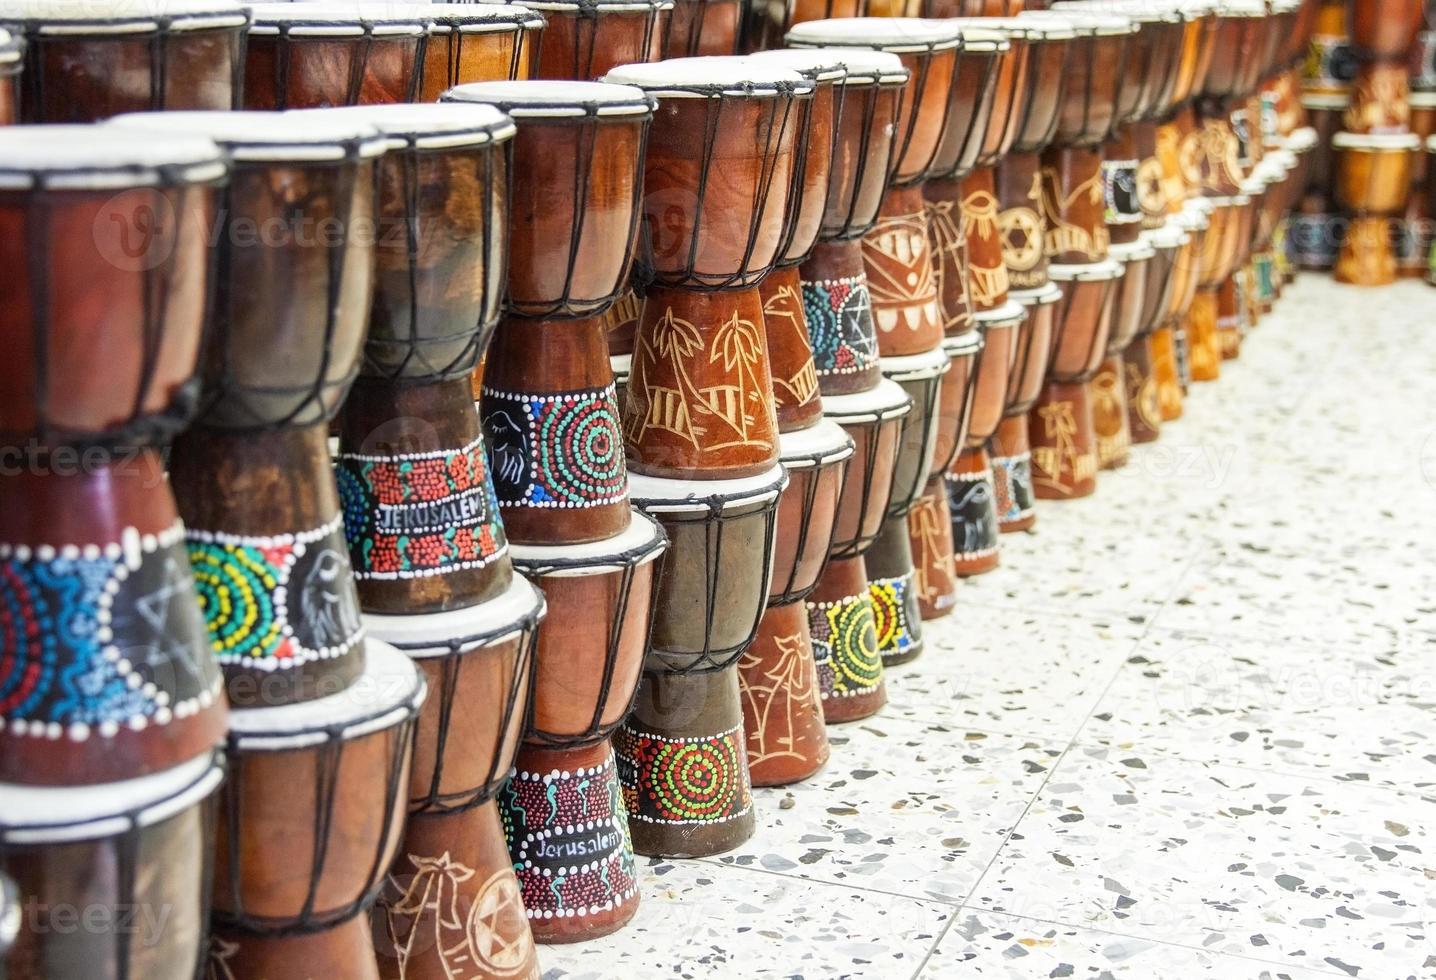 mercato arabo di darbuka. foto